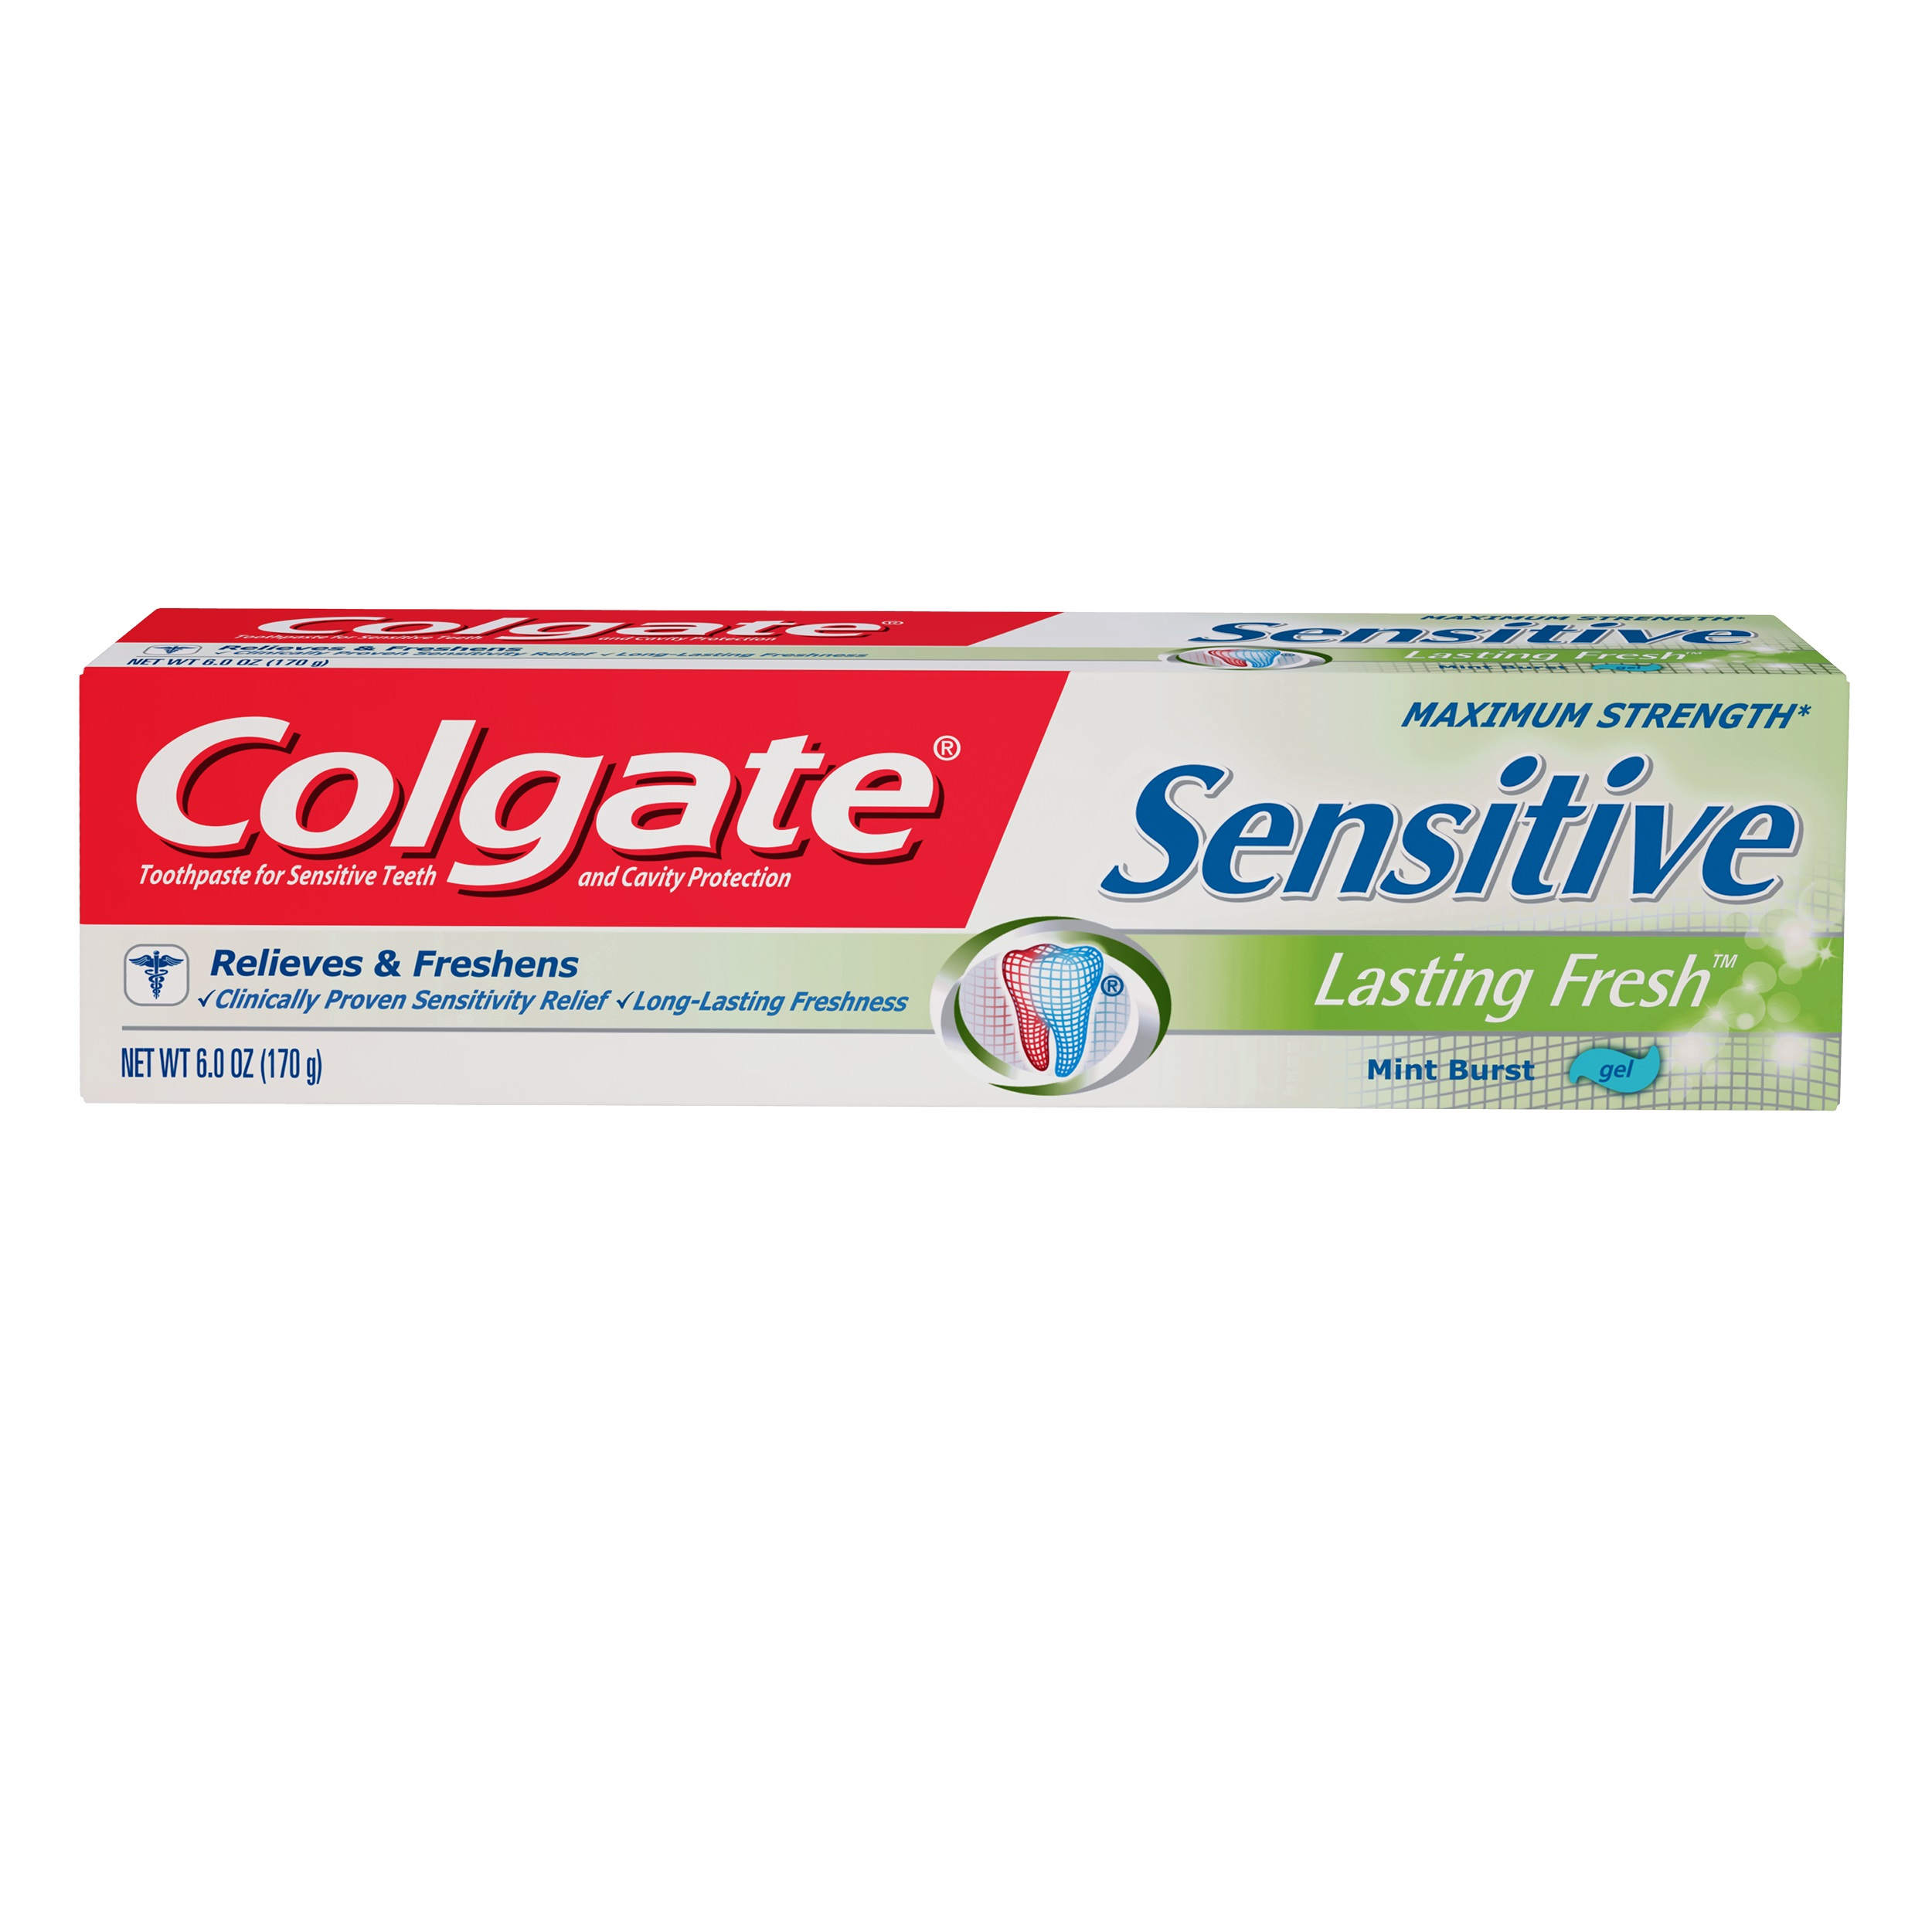 Colgate Sensitive Toothpaste, Lasting Fresh, 6 ounce